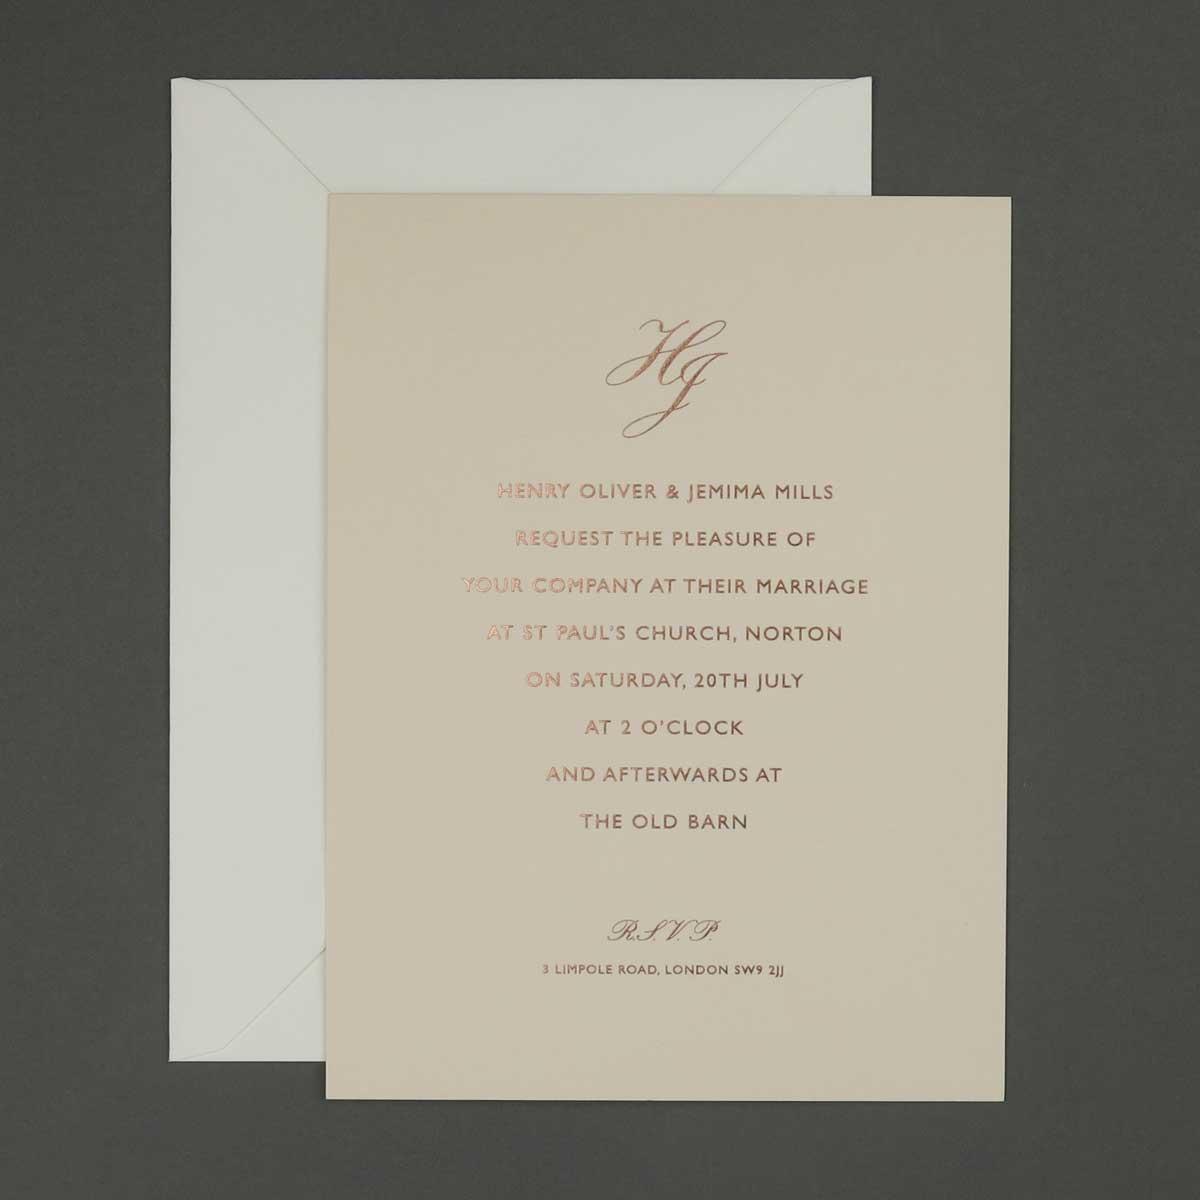 vellum rose wedding invitations wedding stationery With vellum wedding invitations uk